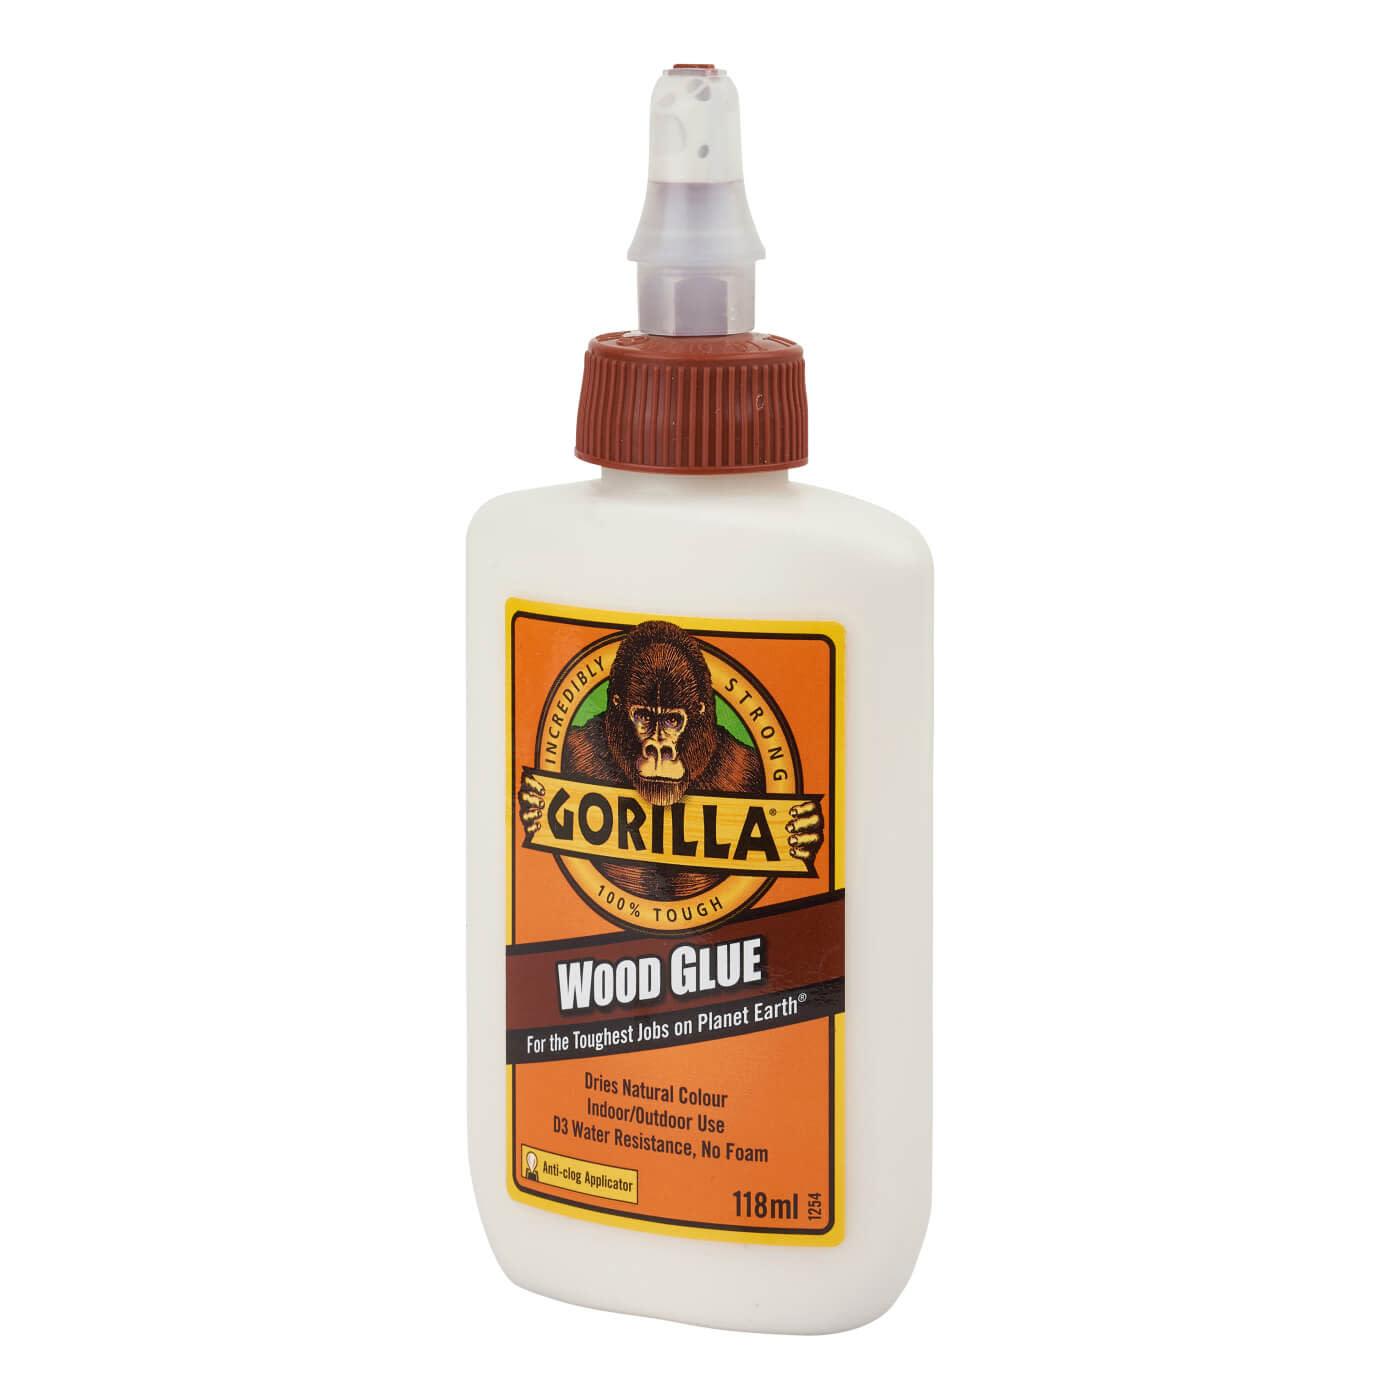 Gorilla Wood Glue - 118ml)